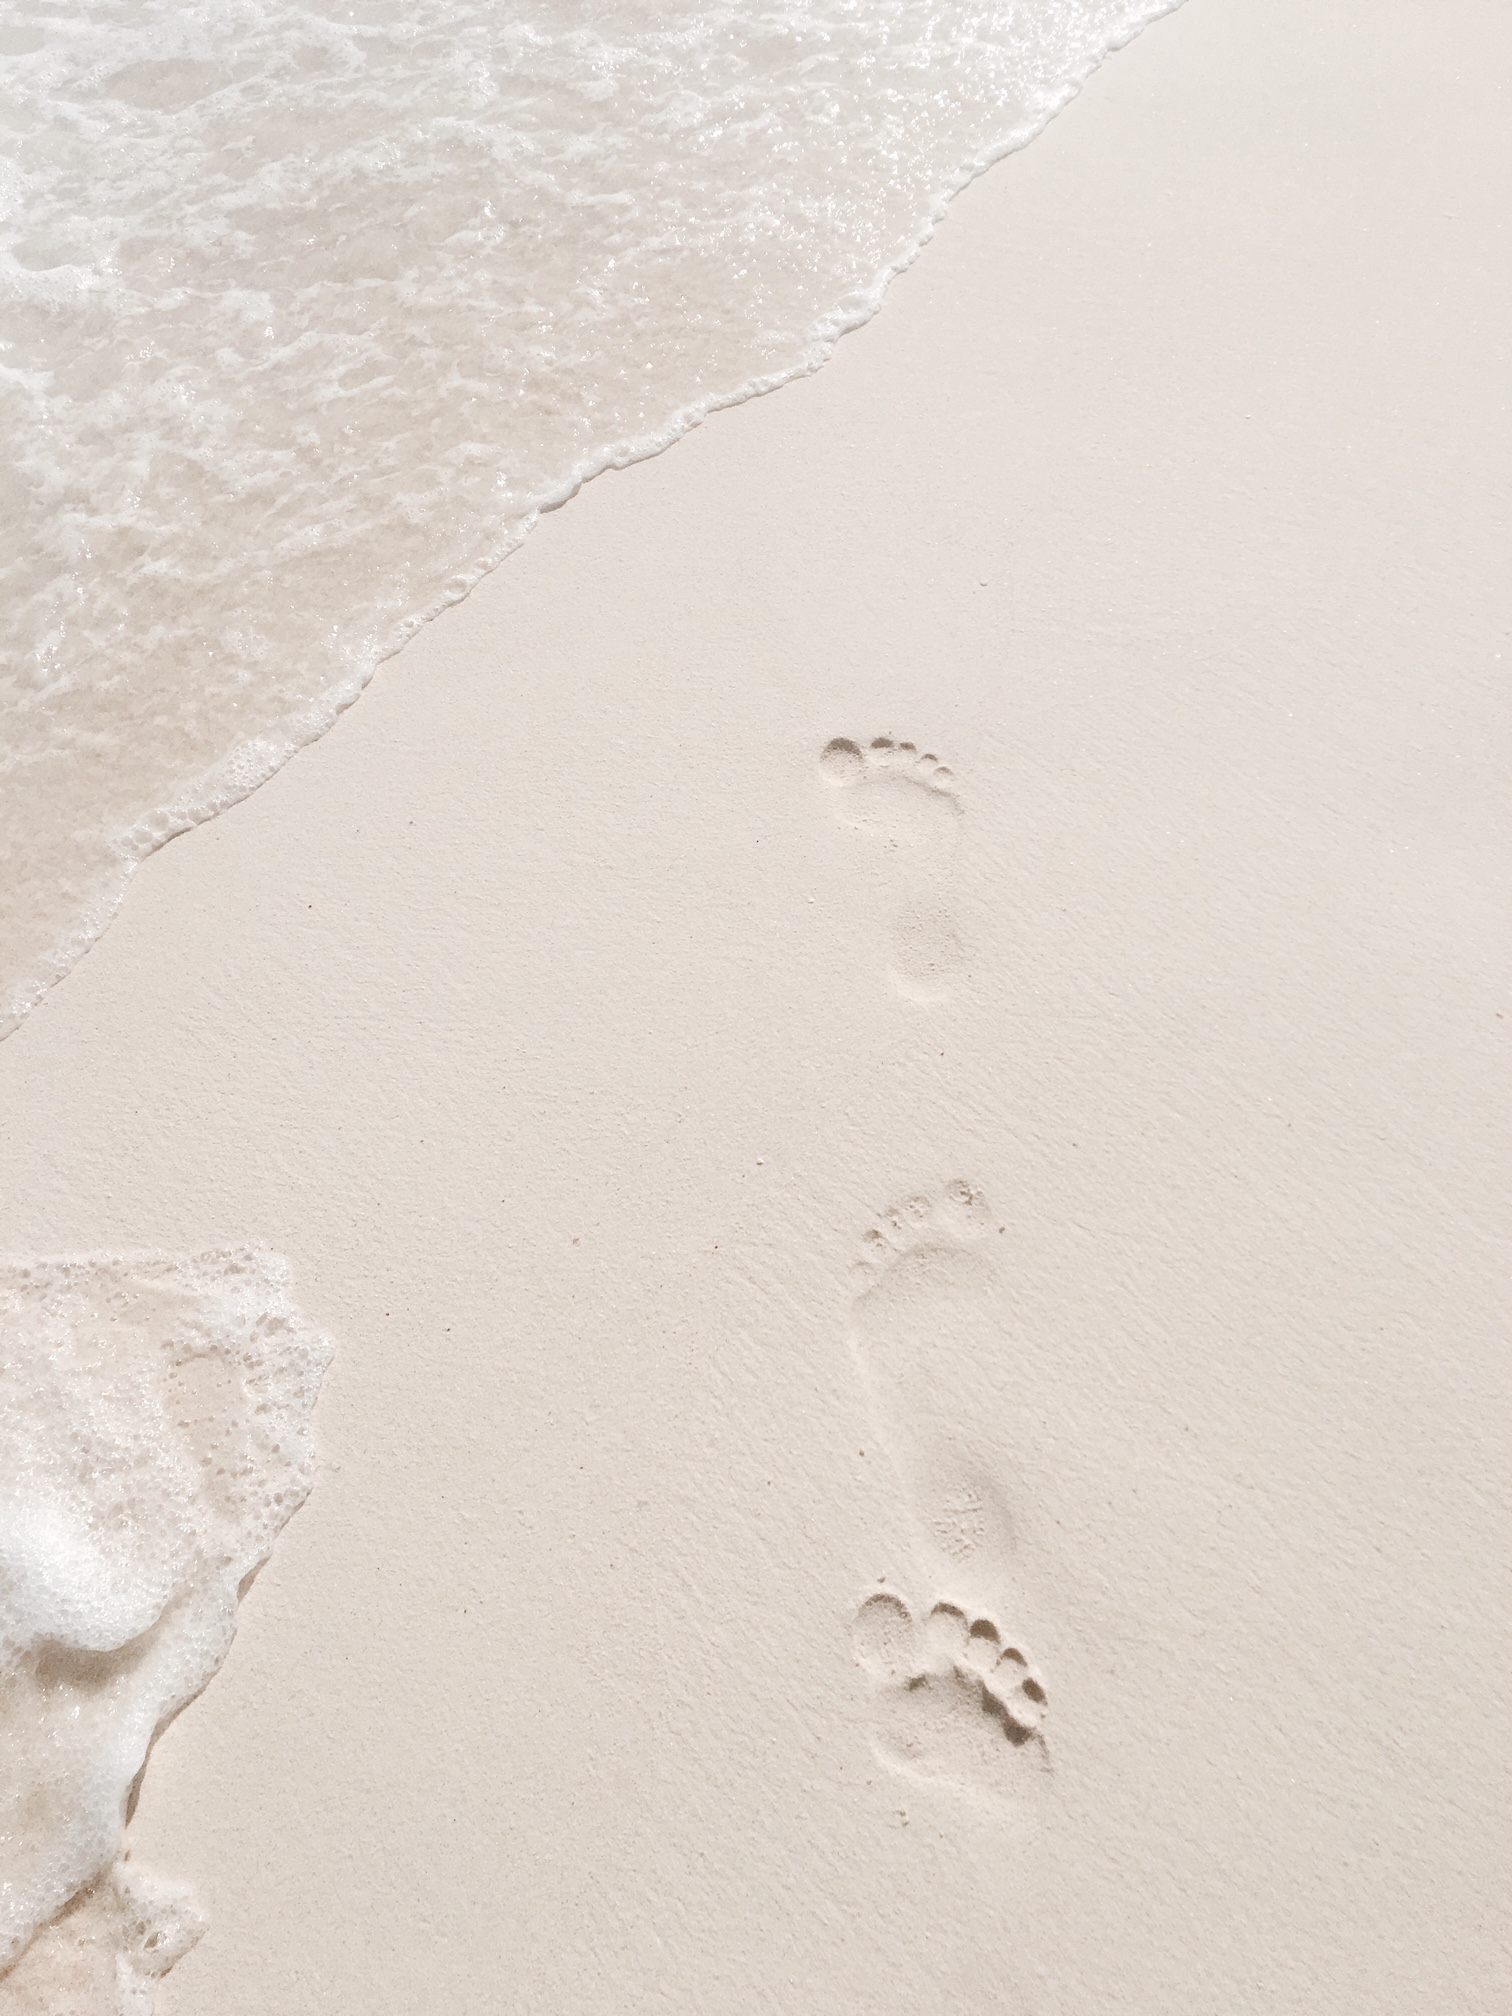 Toes in the Water   Aruba